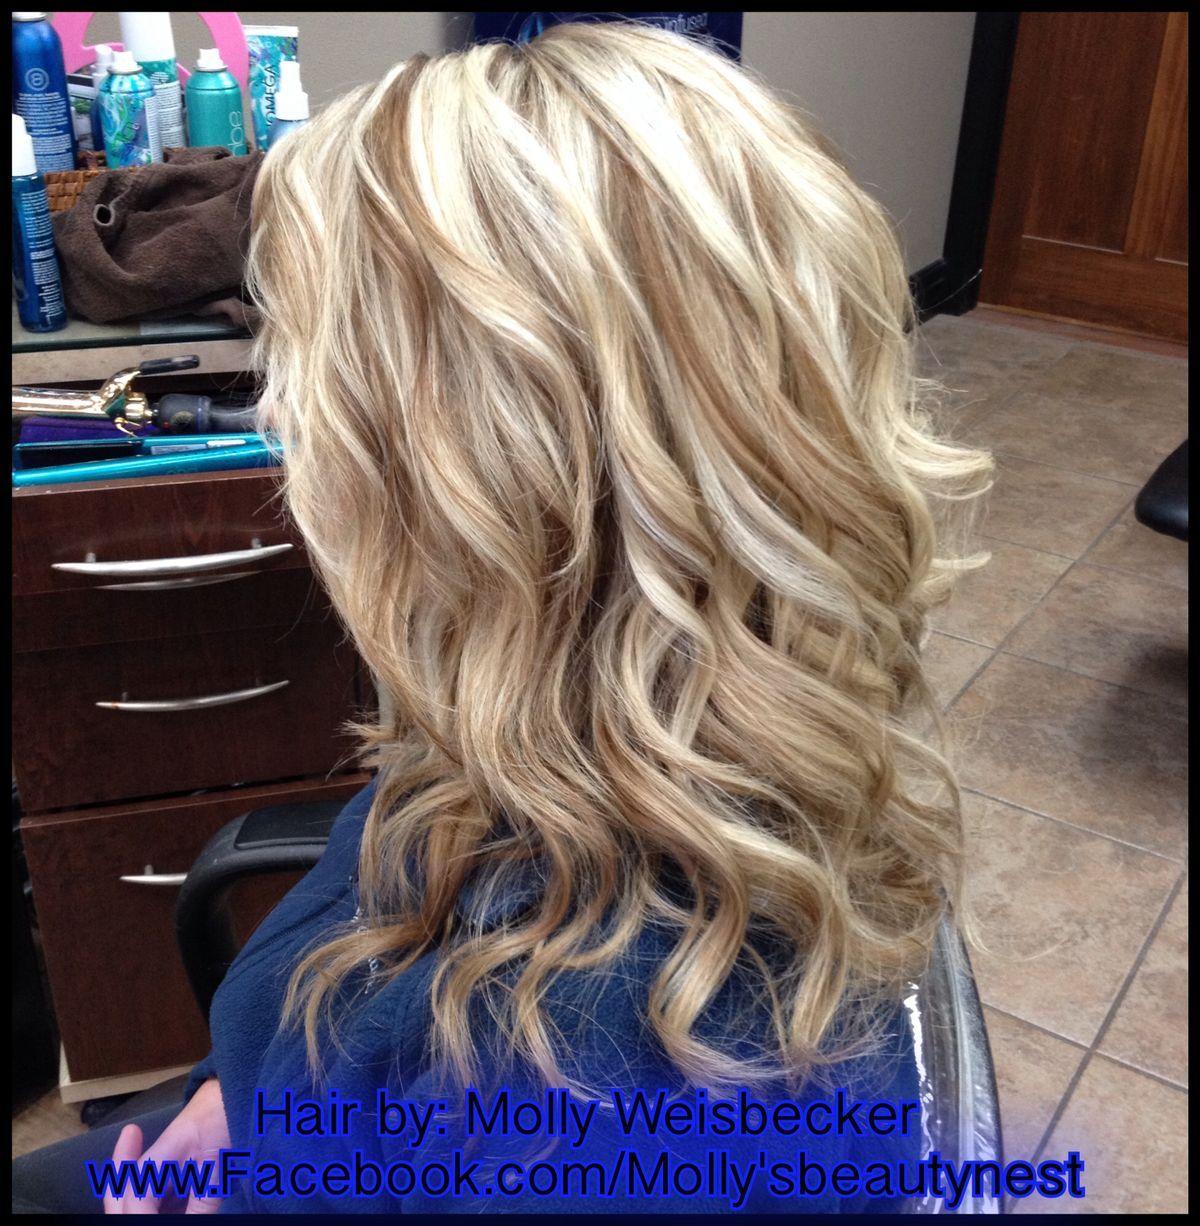 Dbbabcddeeadg pixels hair